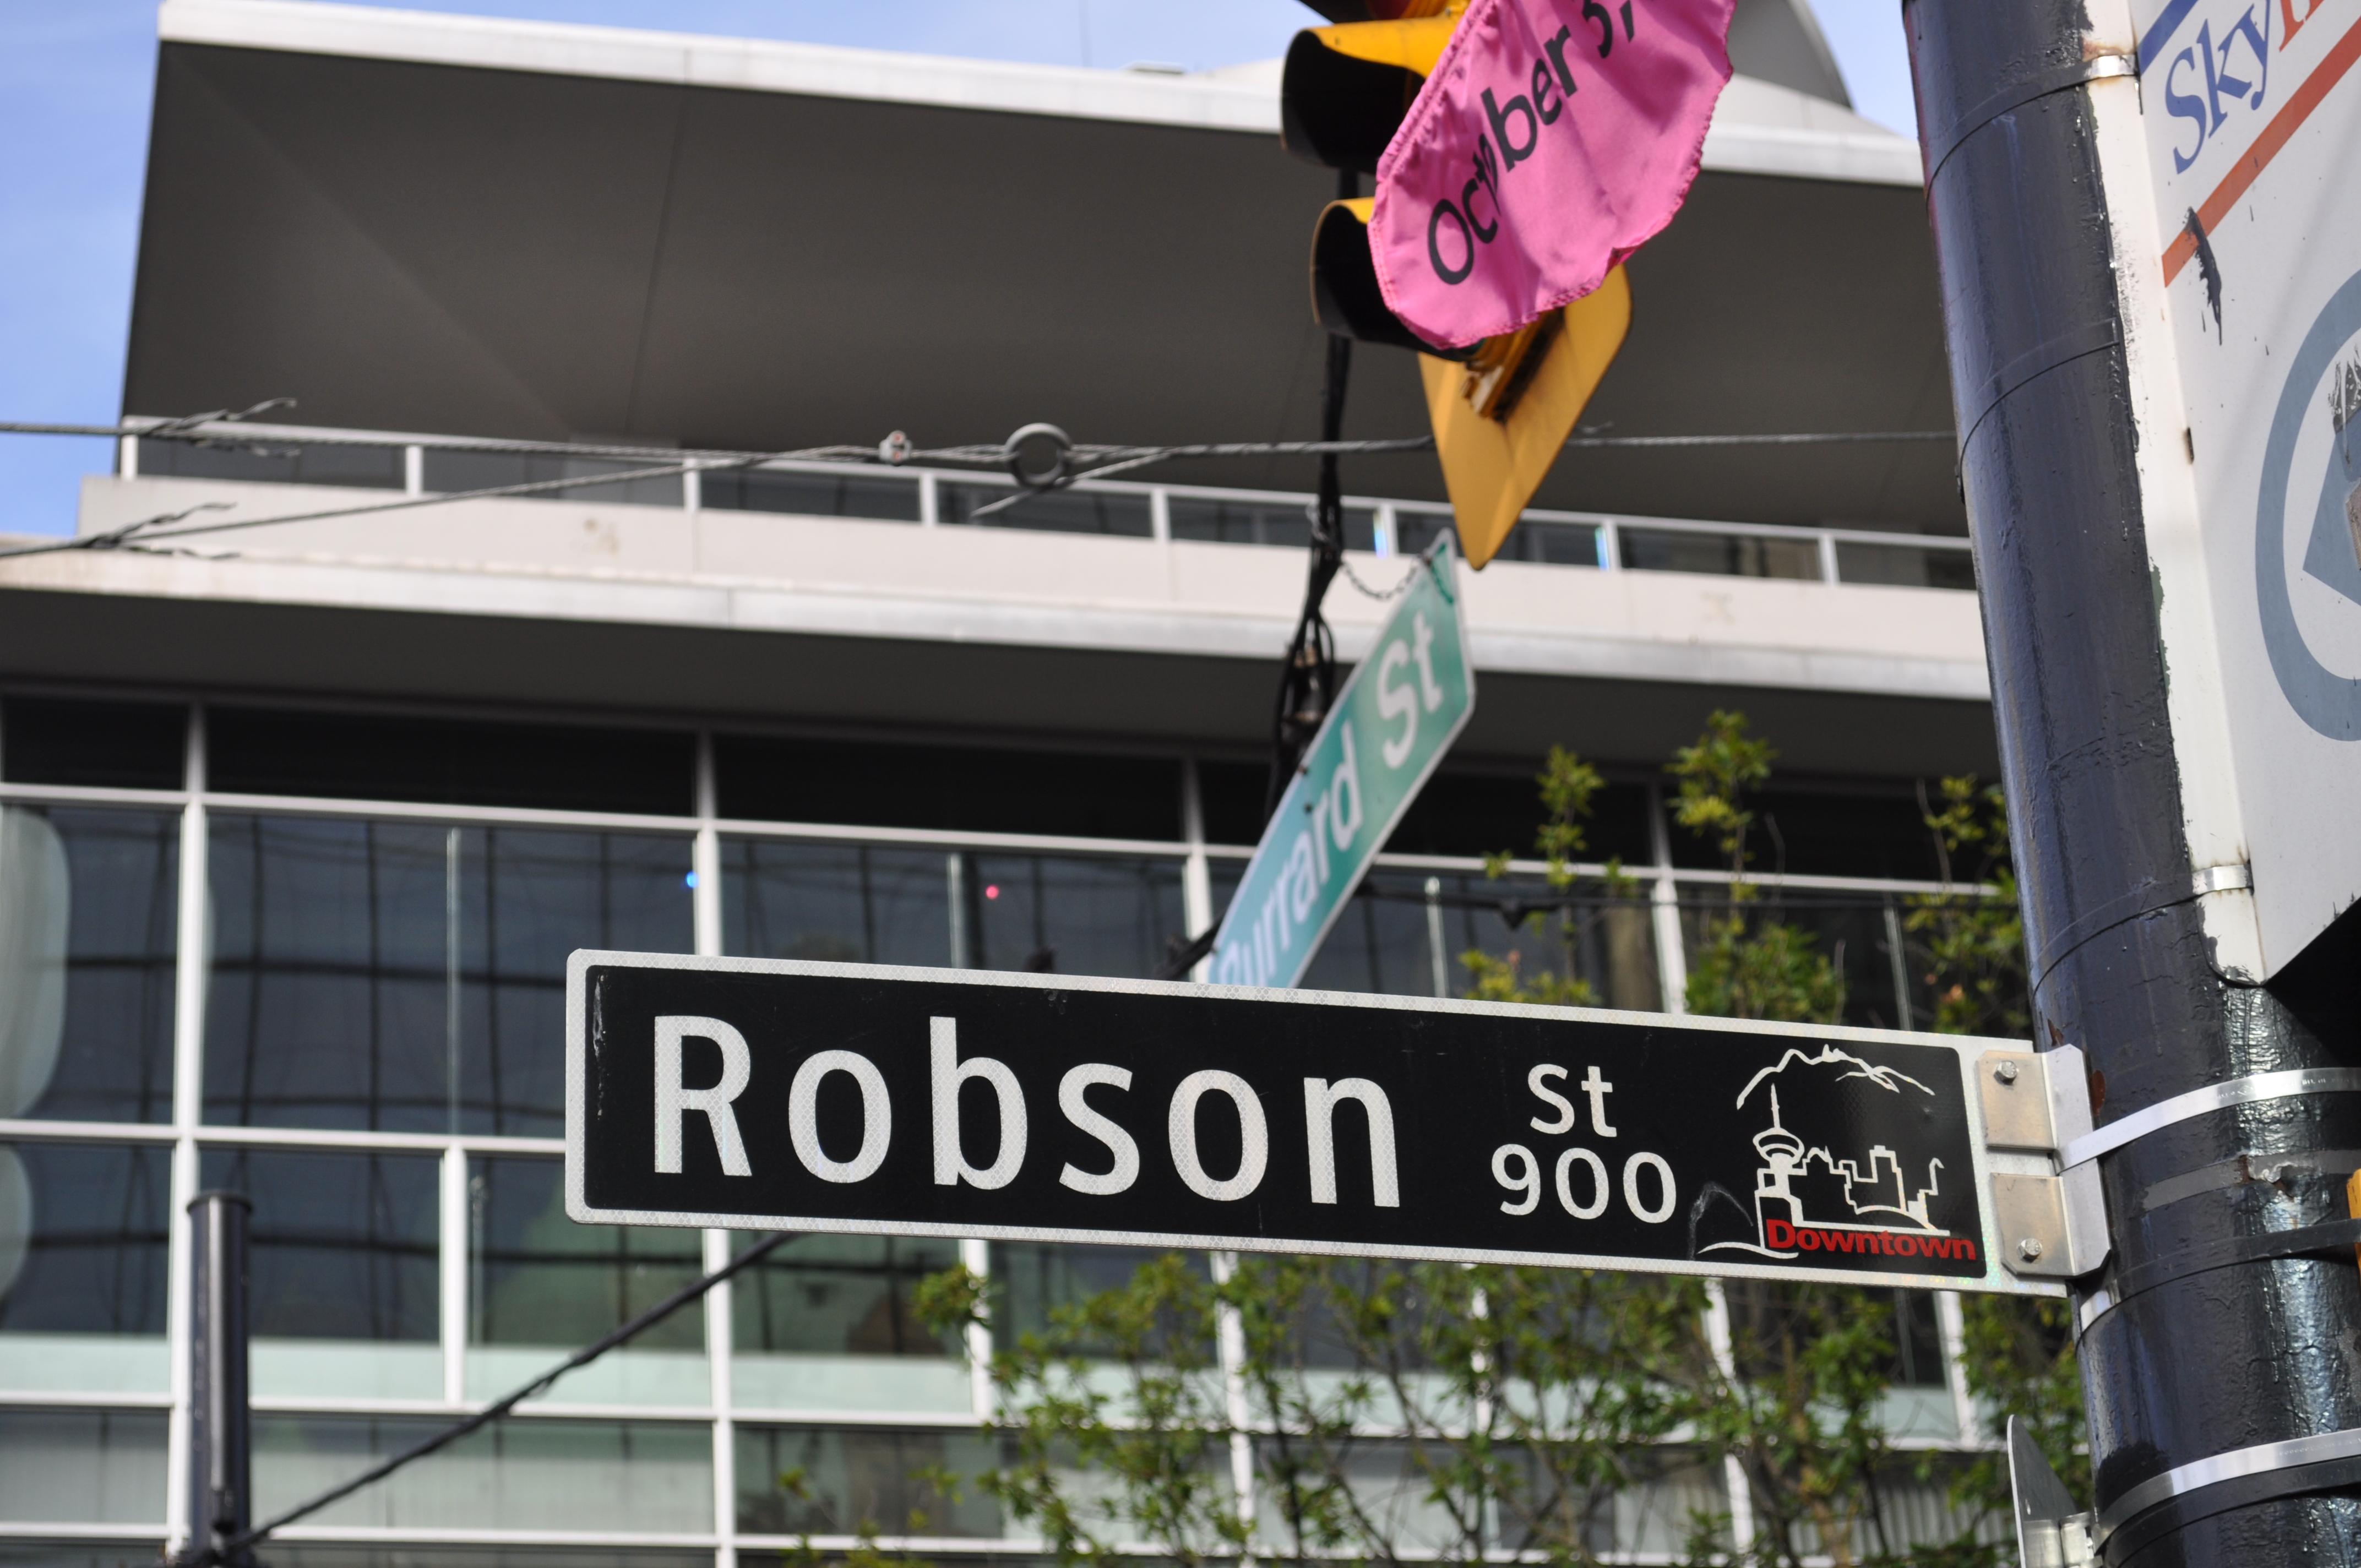 Vancouver - Robson street sign.jpg